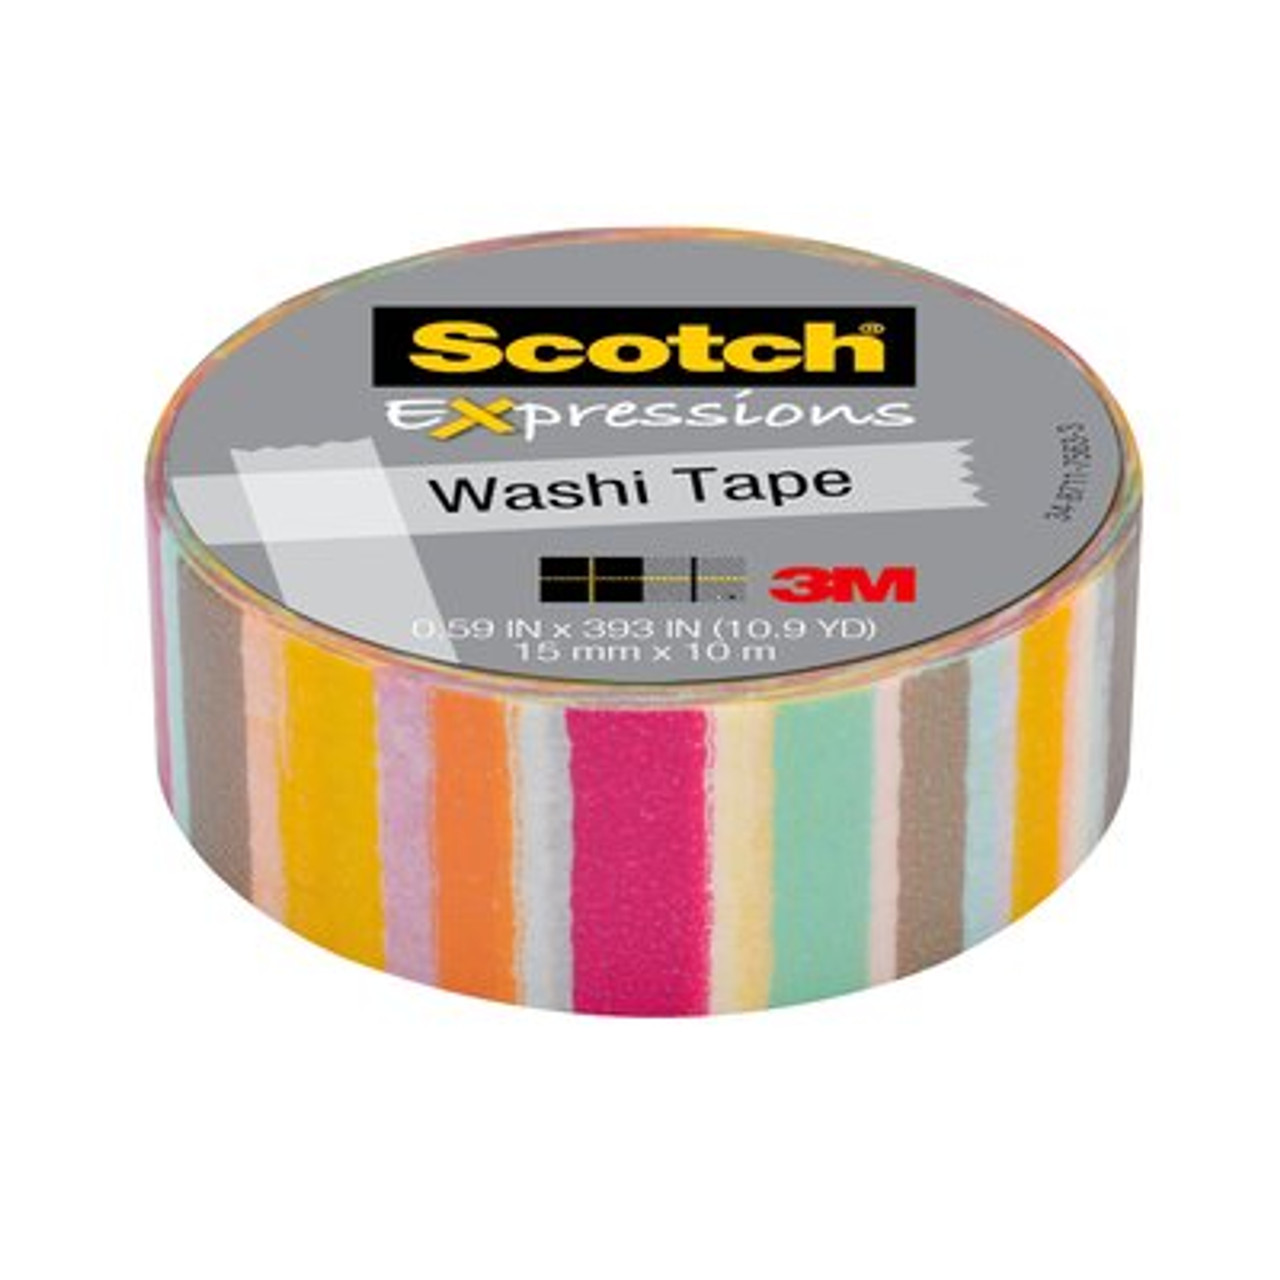 Scotch® Expressions Washi Tape C314-P37, .59 in x 393 in (15 mm x 10 m) Blurred Lines